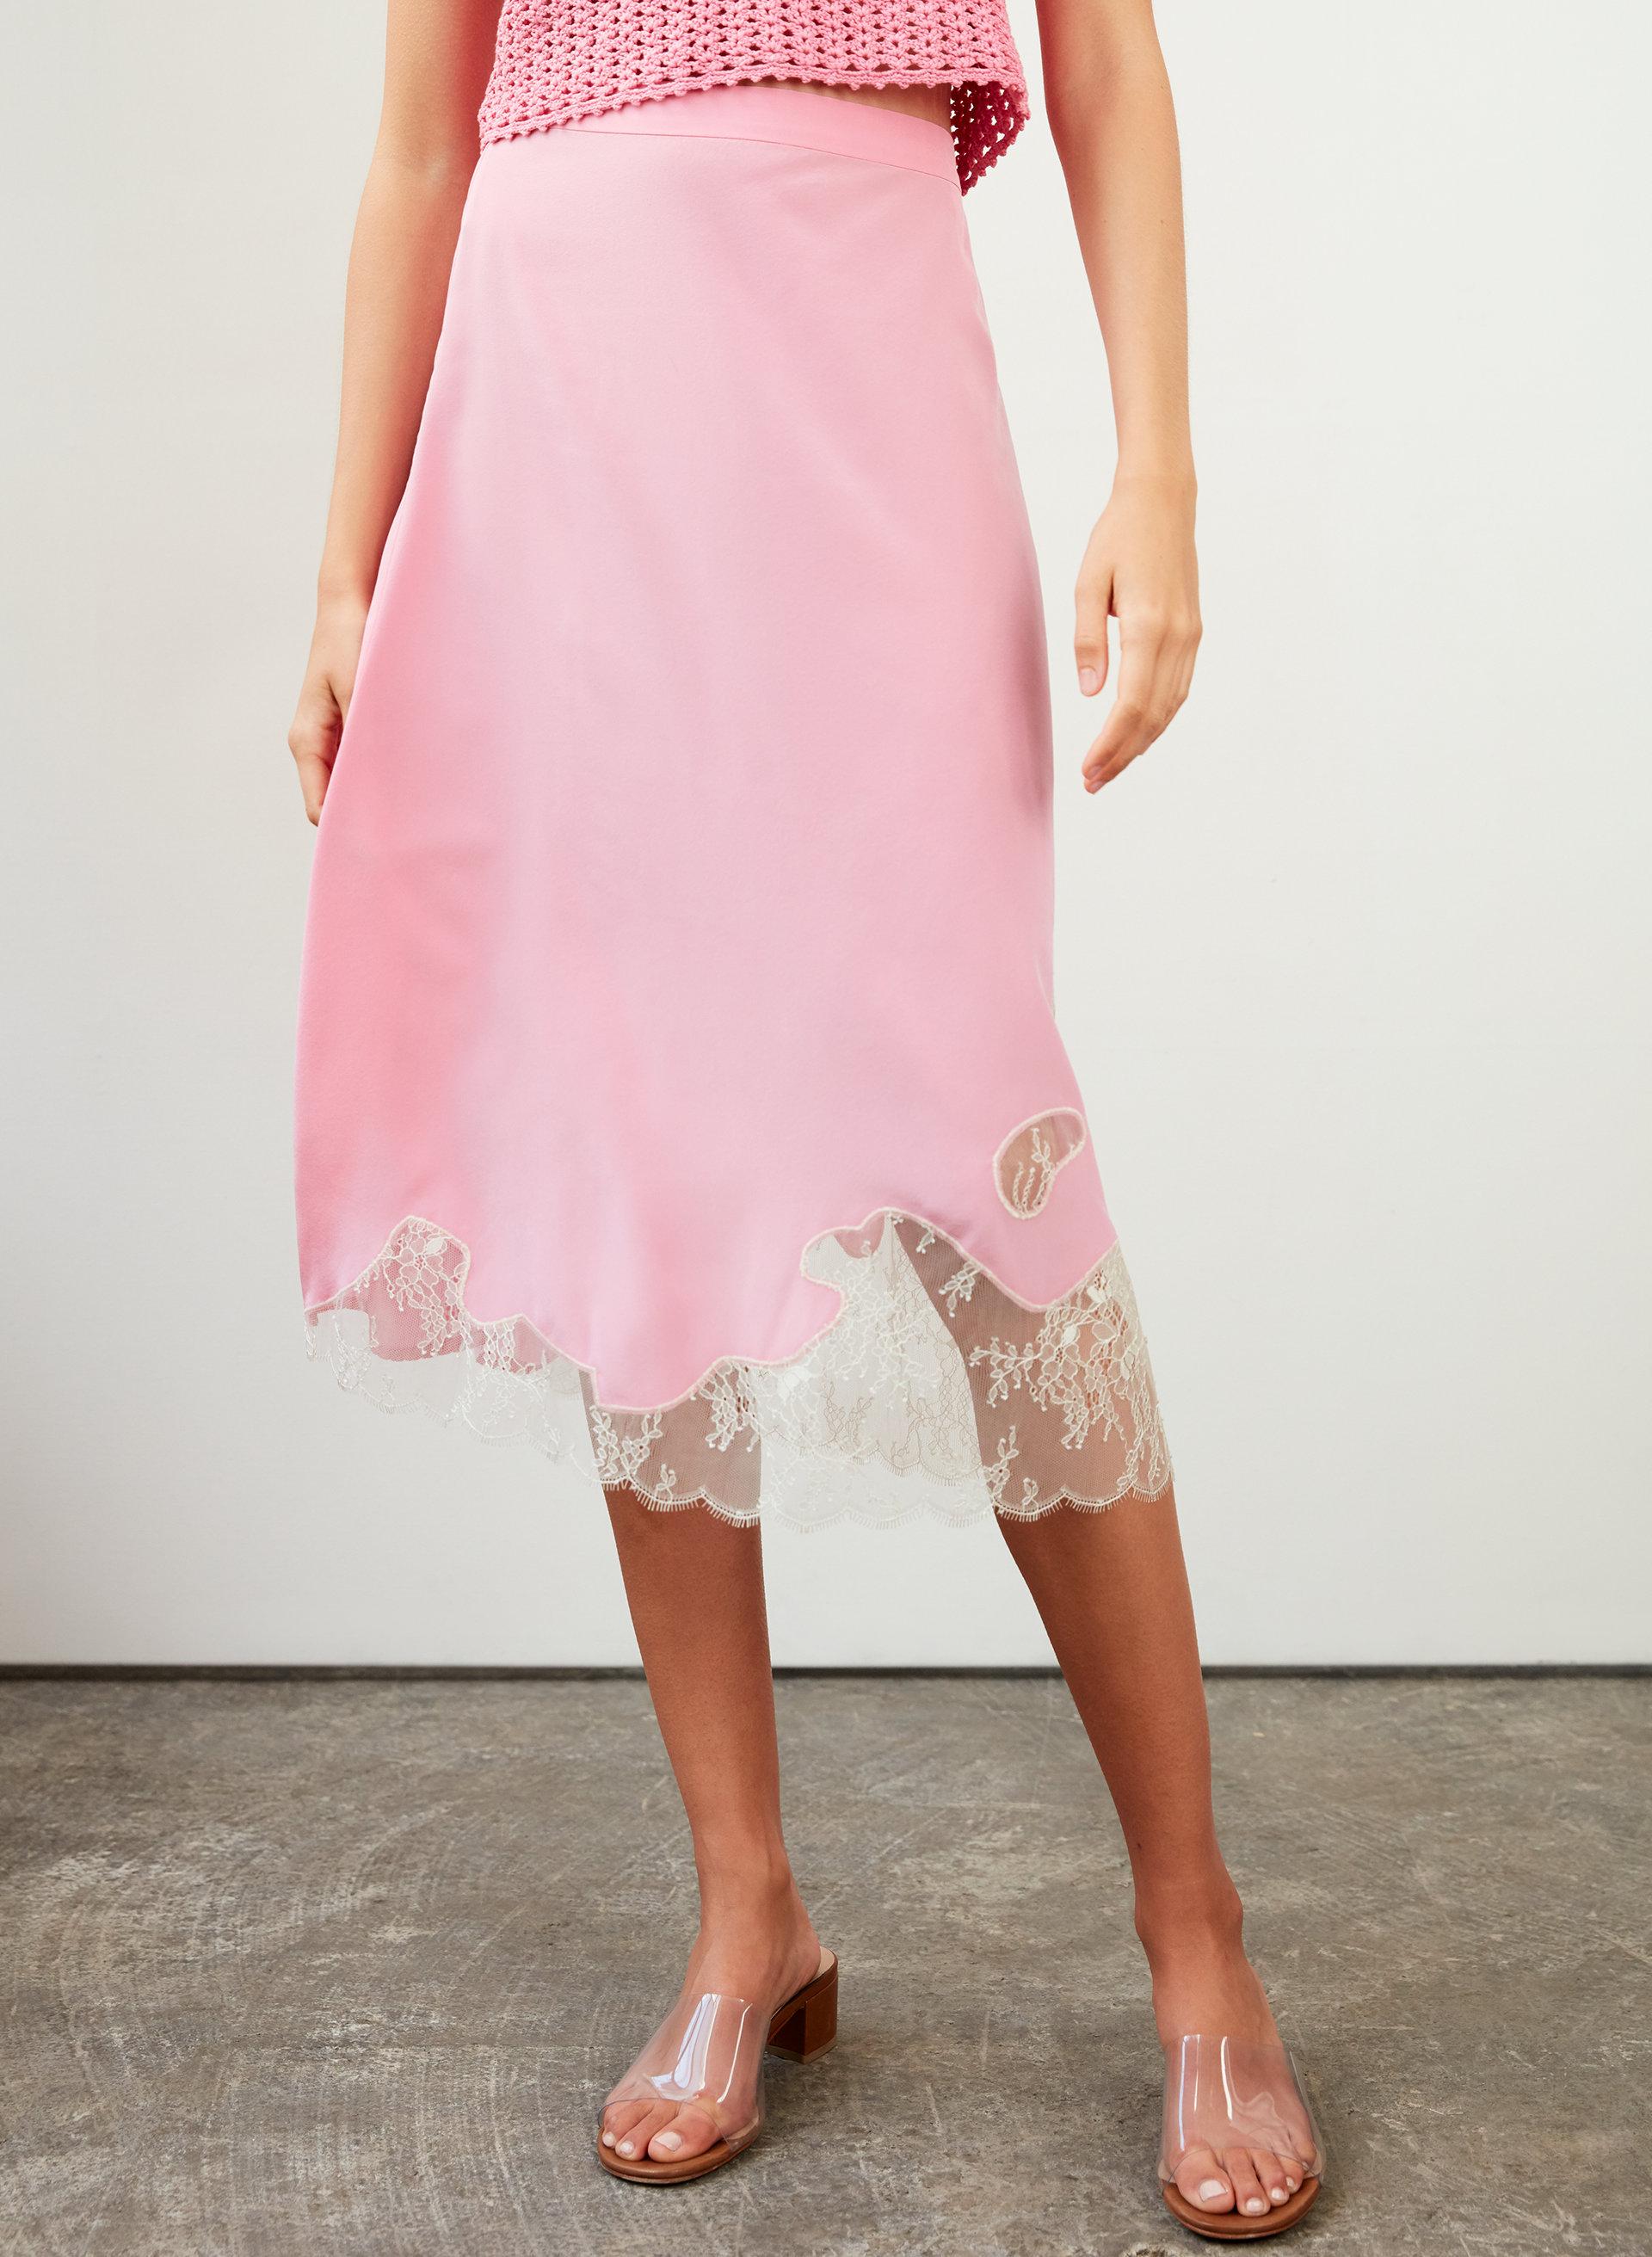 ebe1aa366c81 JESSIME SKIRT - Silk slip skirt. Styled with cherita knit top ...